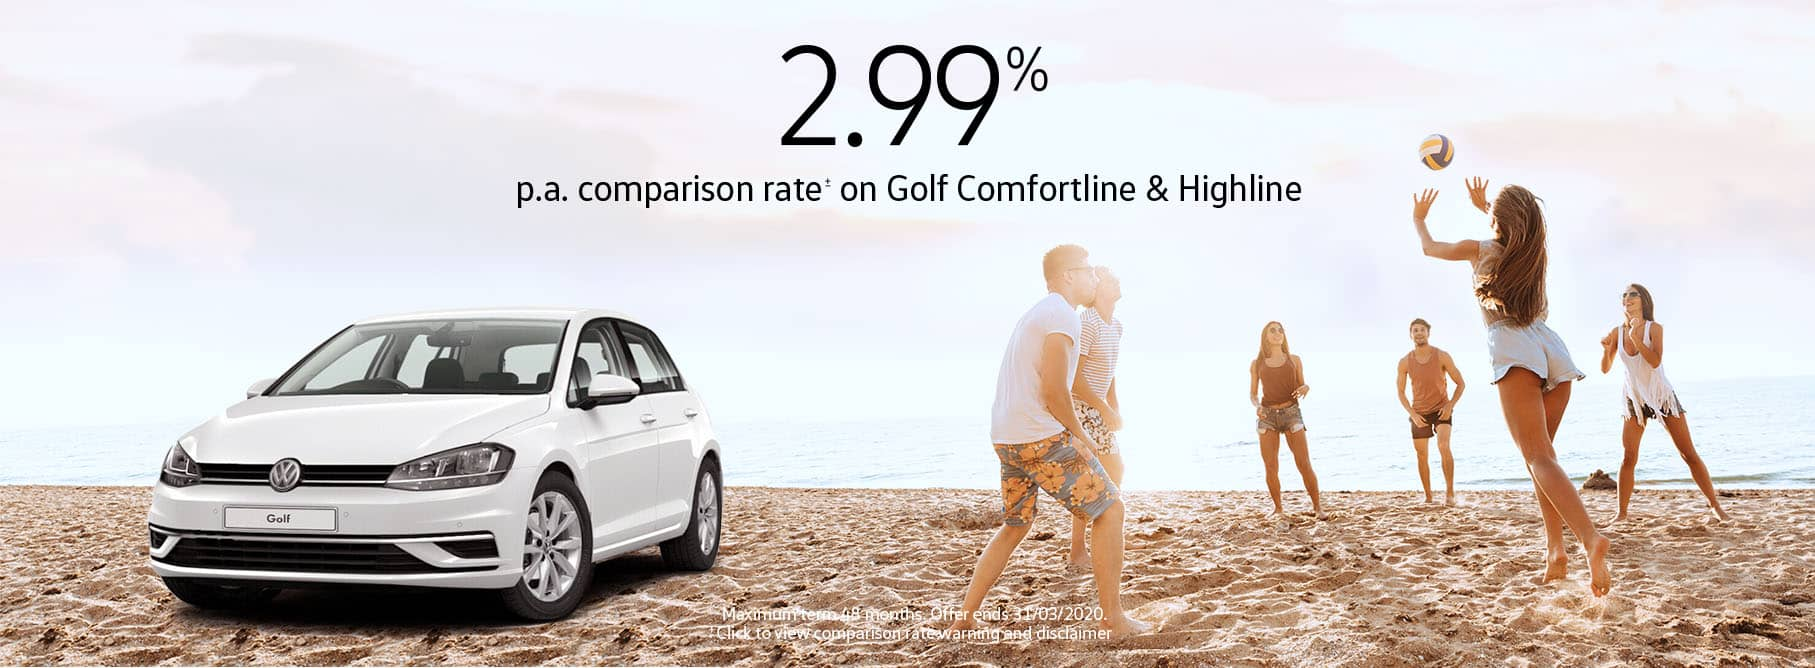 2.99 Comparison Rate for Golf Comfortline